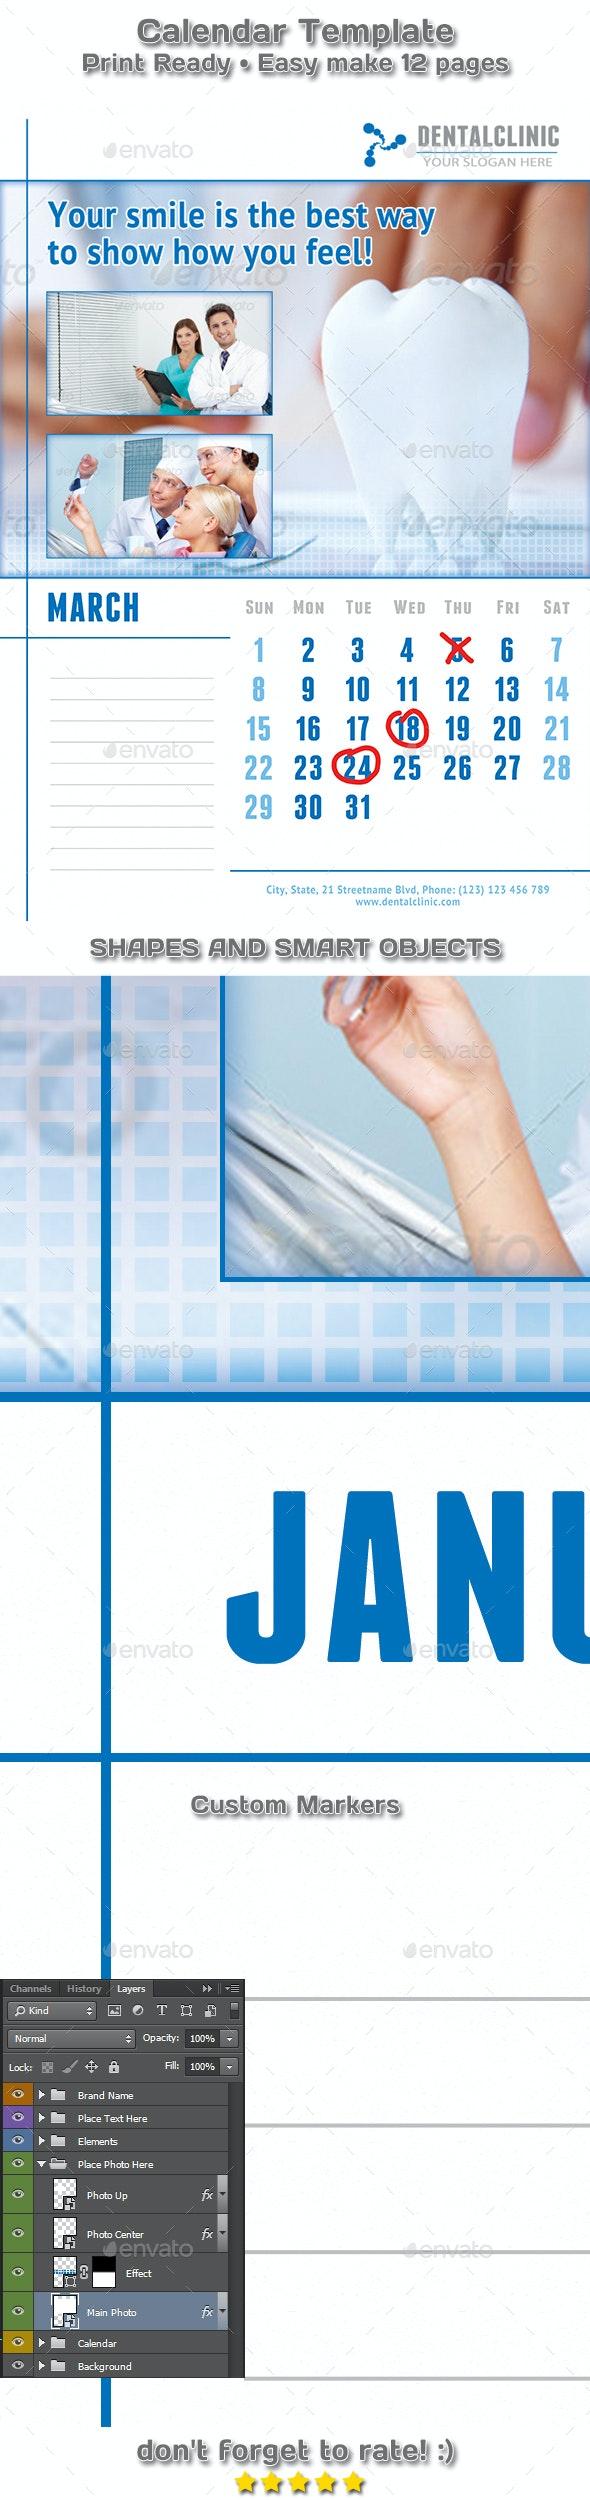 Medical or Dental Clinic Calendar 2019 - 2020 Template - Calendars Stationery